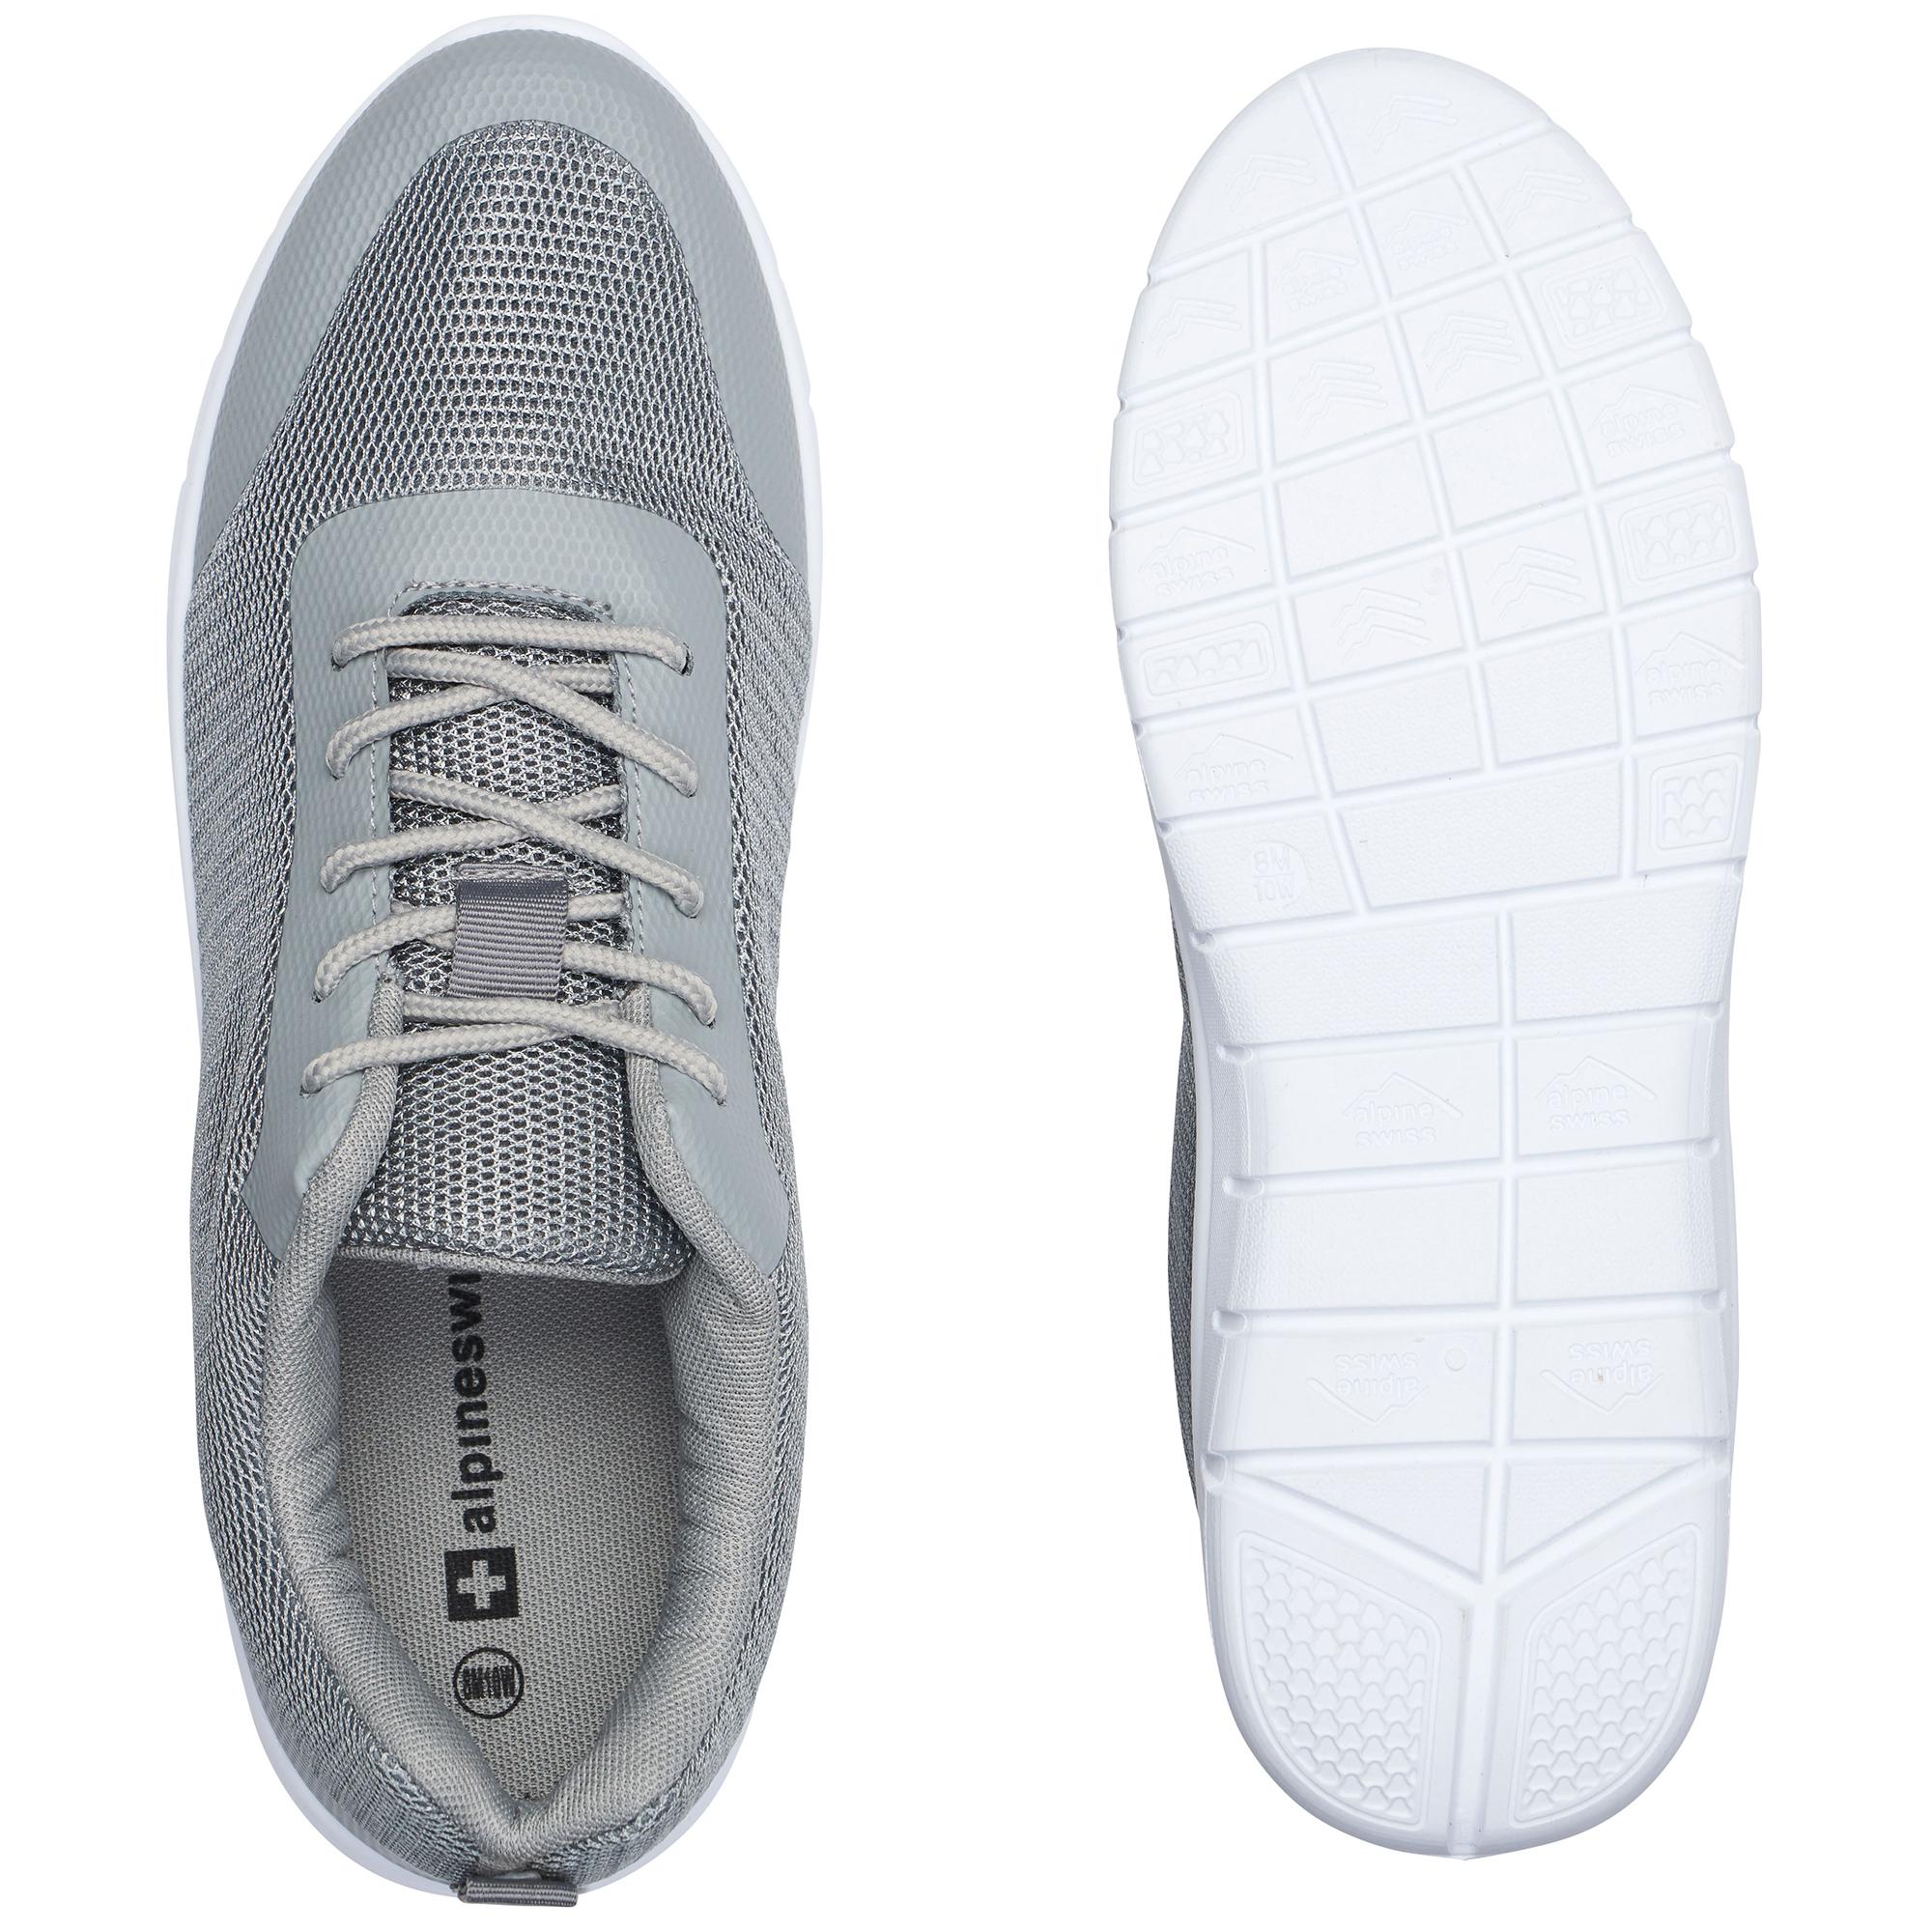 thumbnail 25 - Alpine Swiss Bolt Mesh Sneaker Casual Light Shoes For Men With Shoe Bag